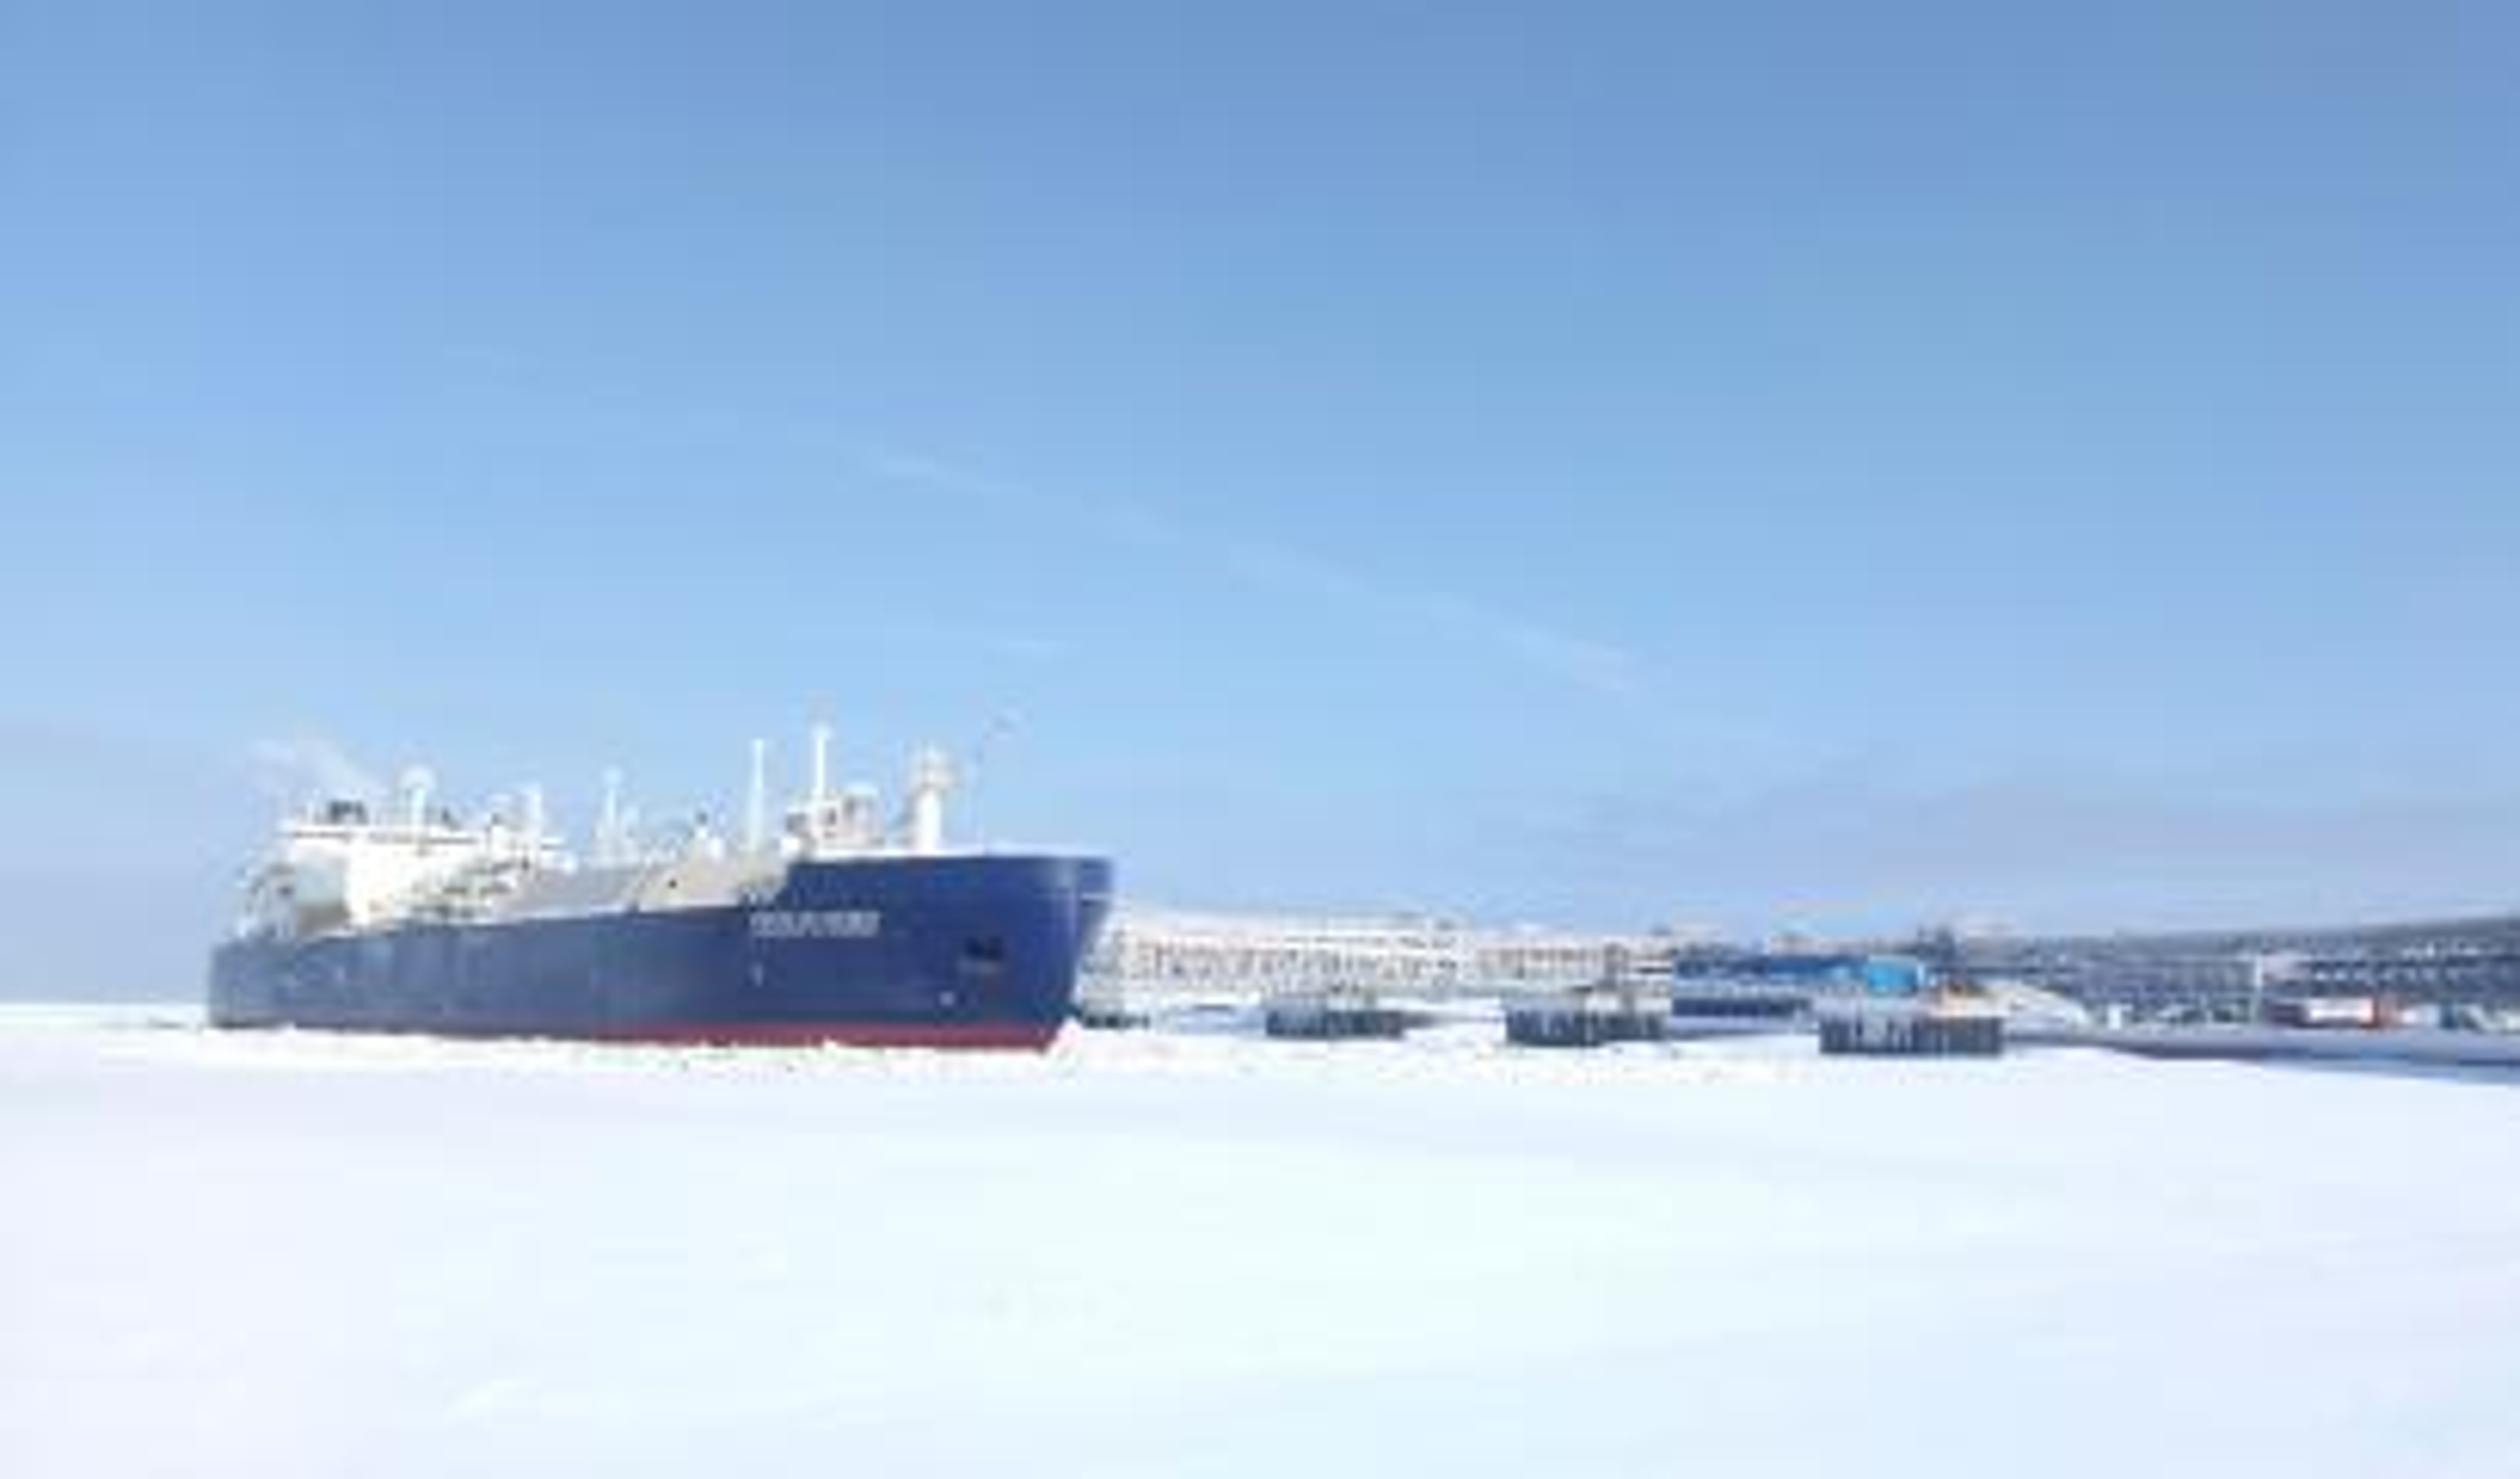 Ice-breaking tanker Christophe de Margerie is docked in Arctic port of Sabetta